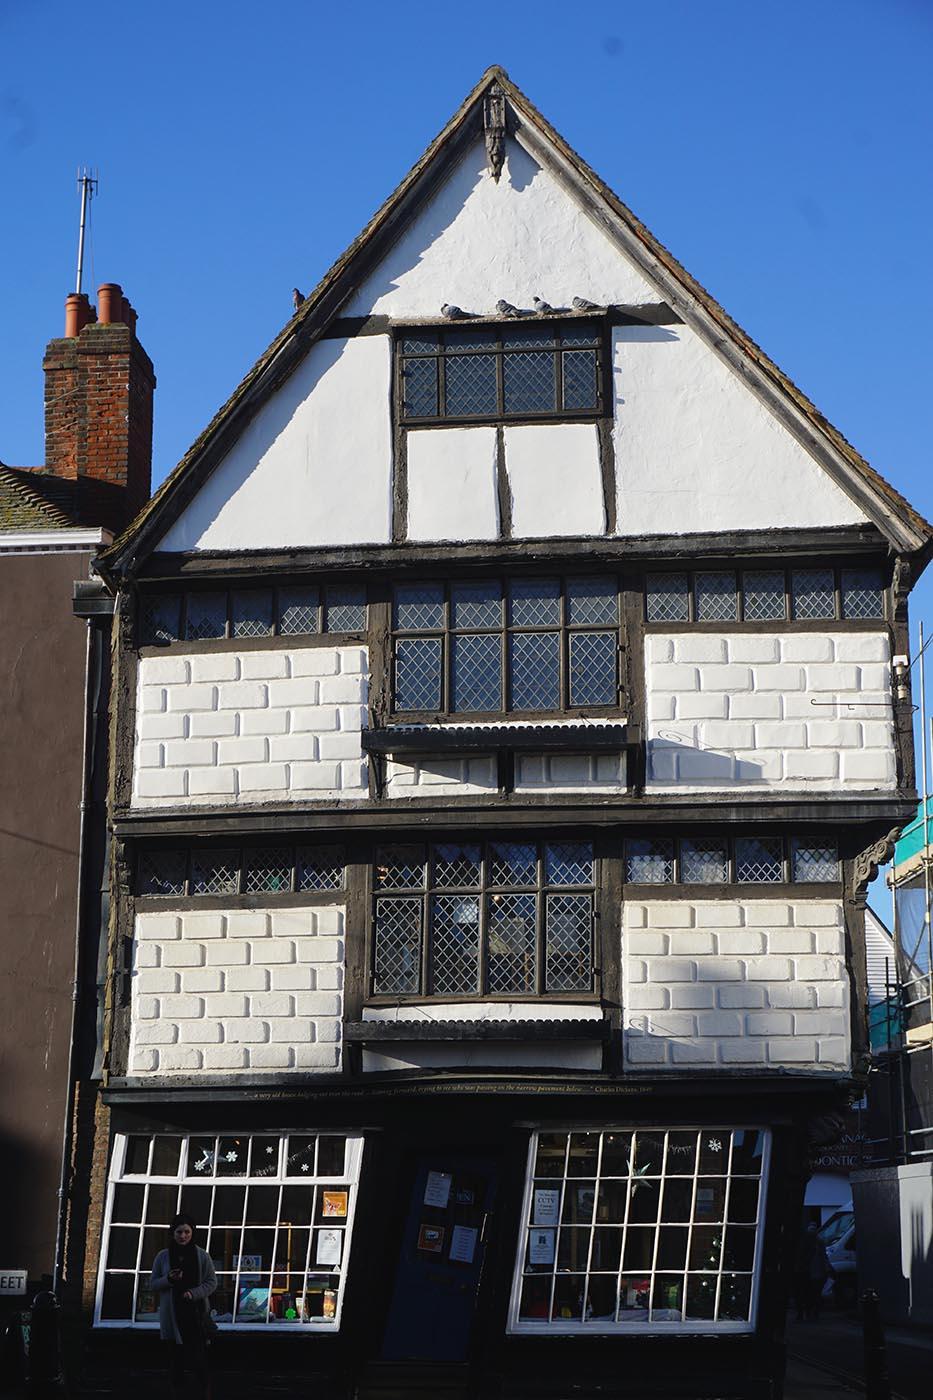 Wonky house, Canterbury